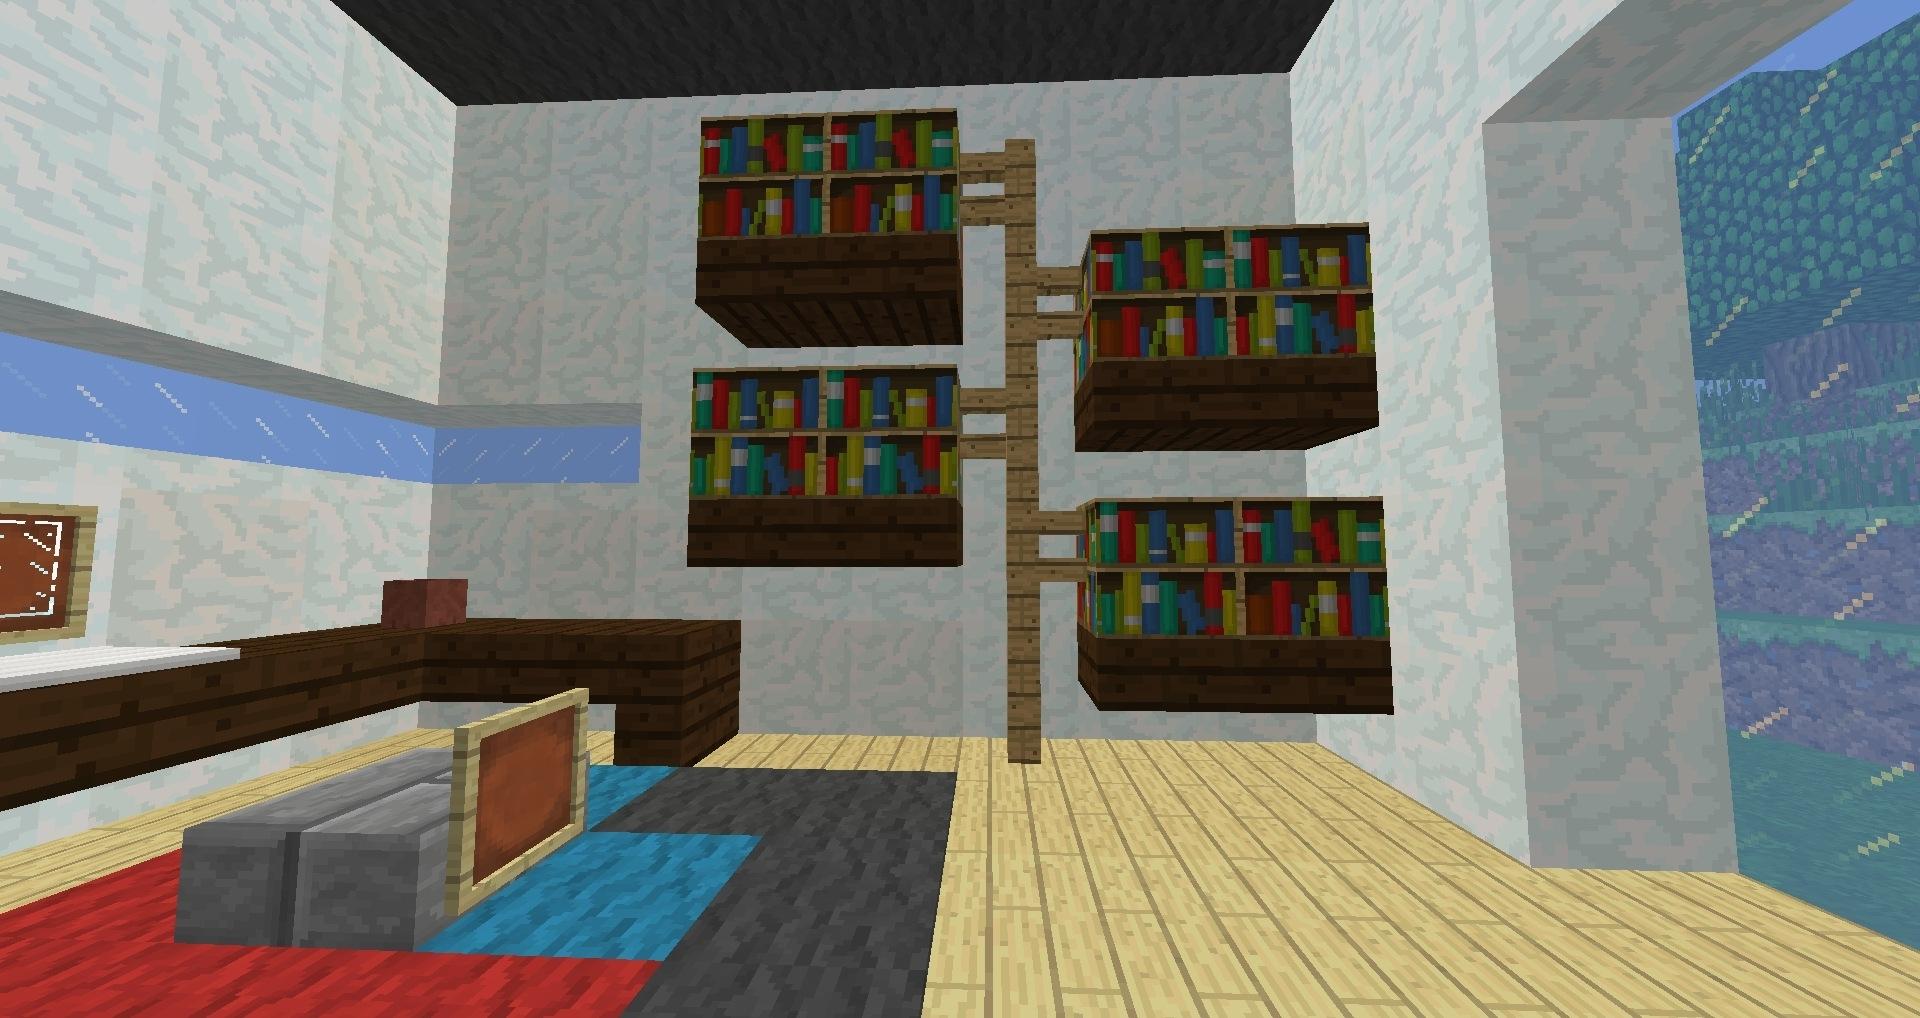 Well Known Minecraft Bookcases In Minecraft Furniture – Storage (View 15 of 15)